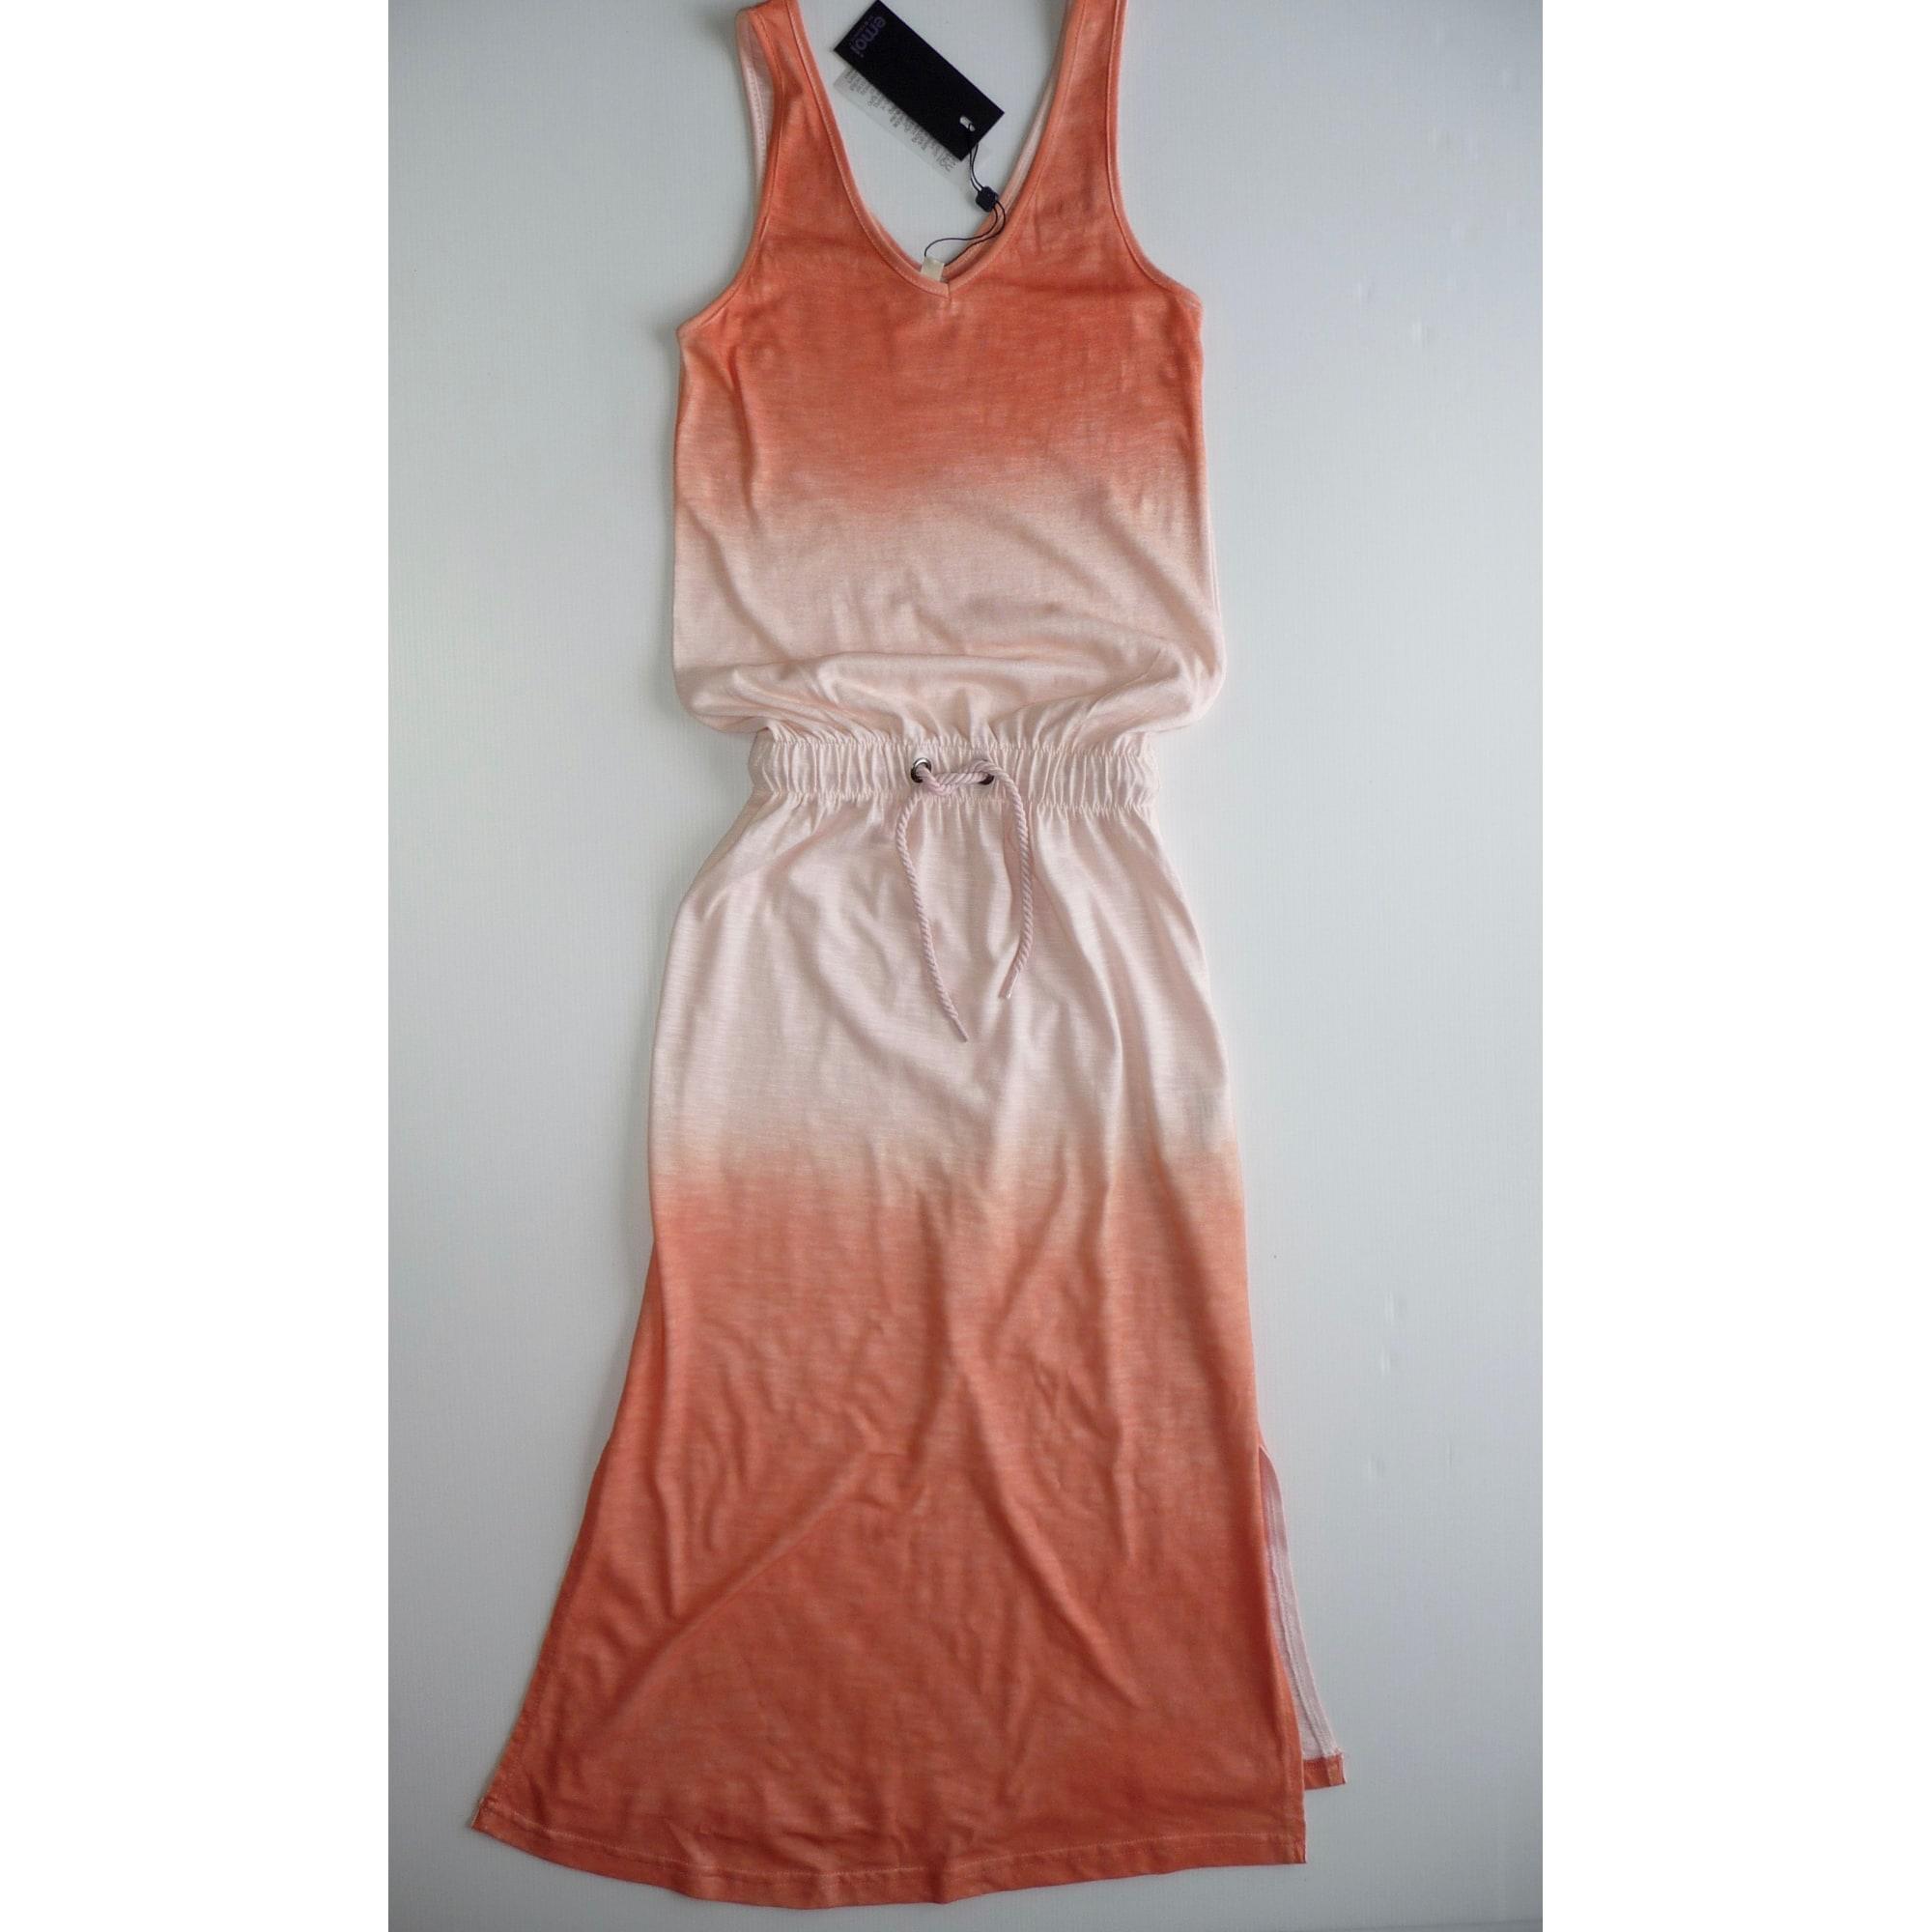 Robe EMOI BY EMONITE coton orange 7-8 ans